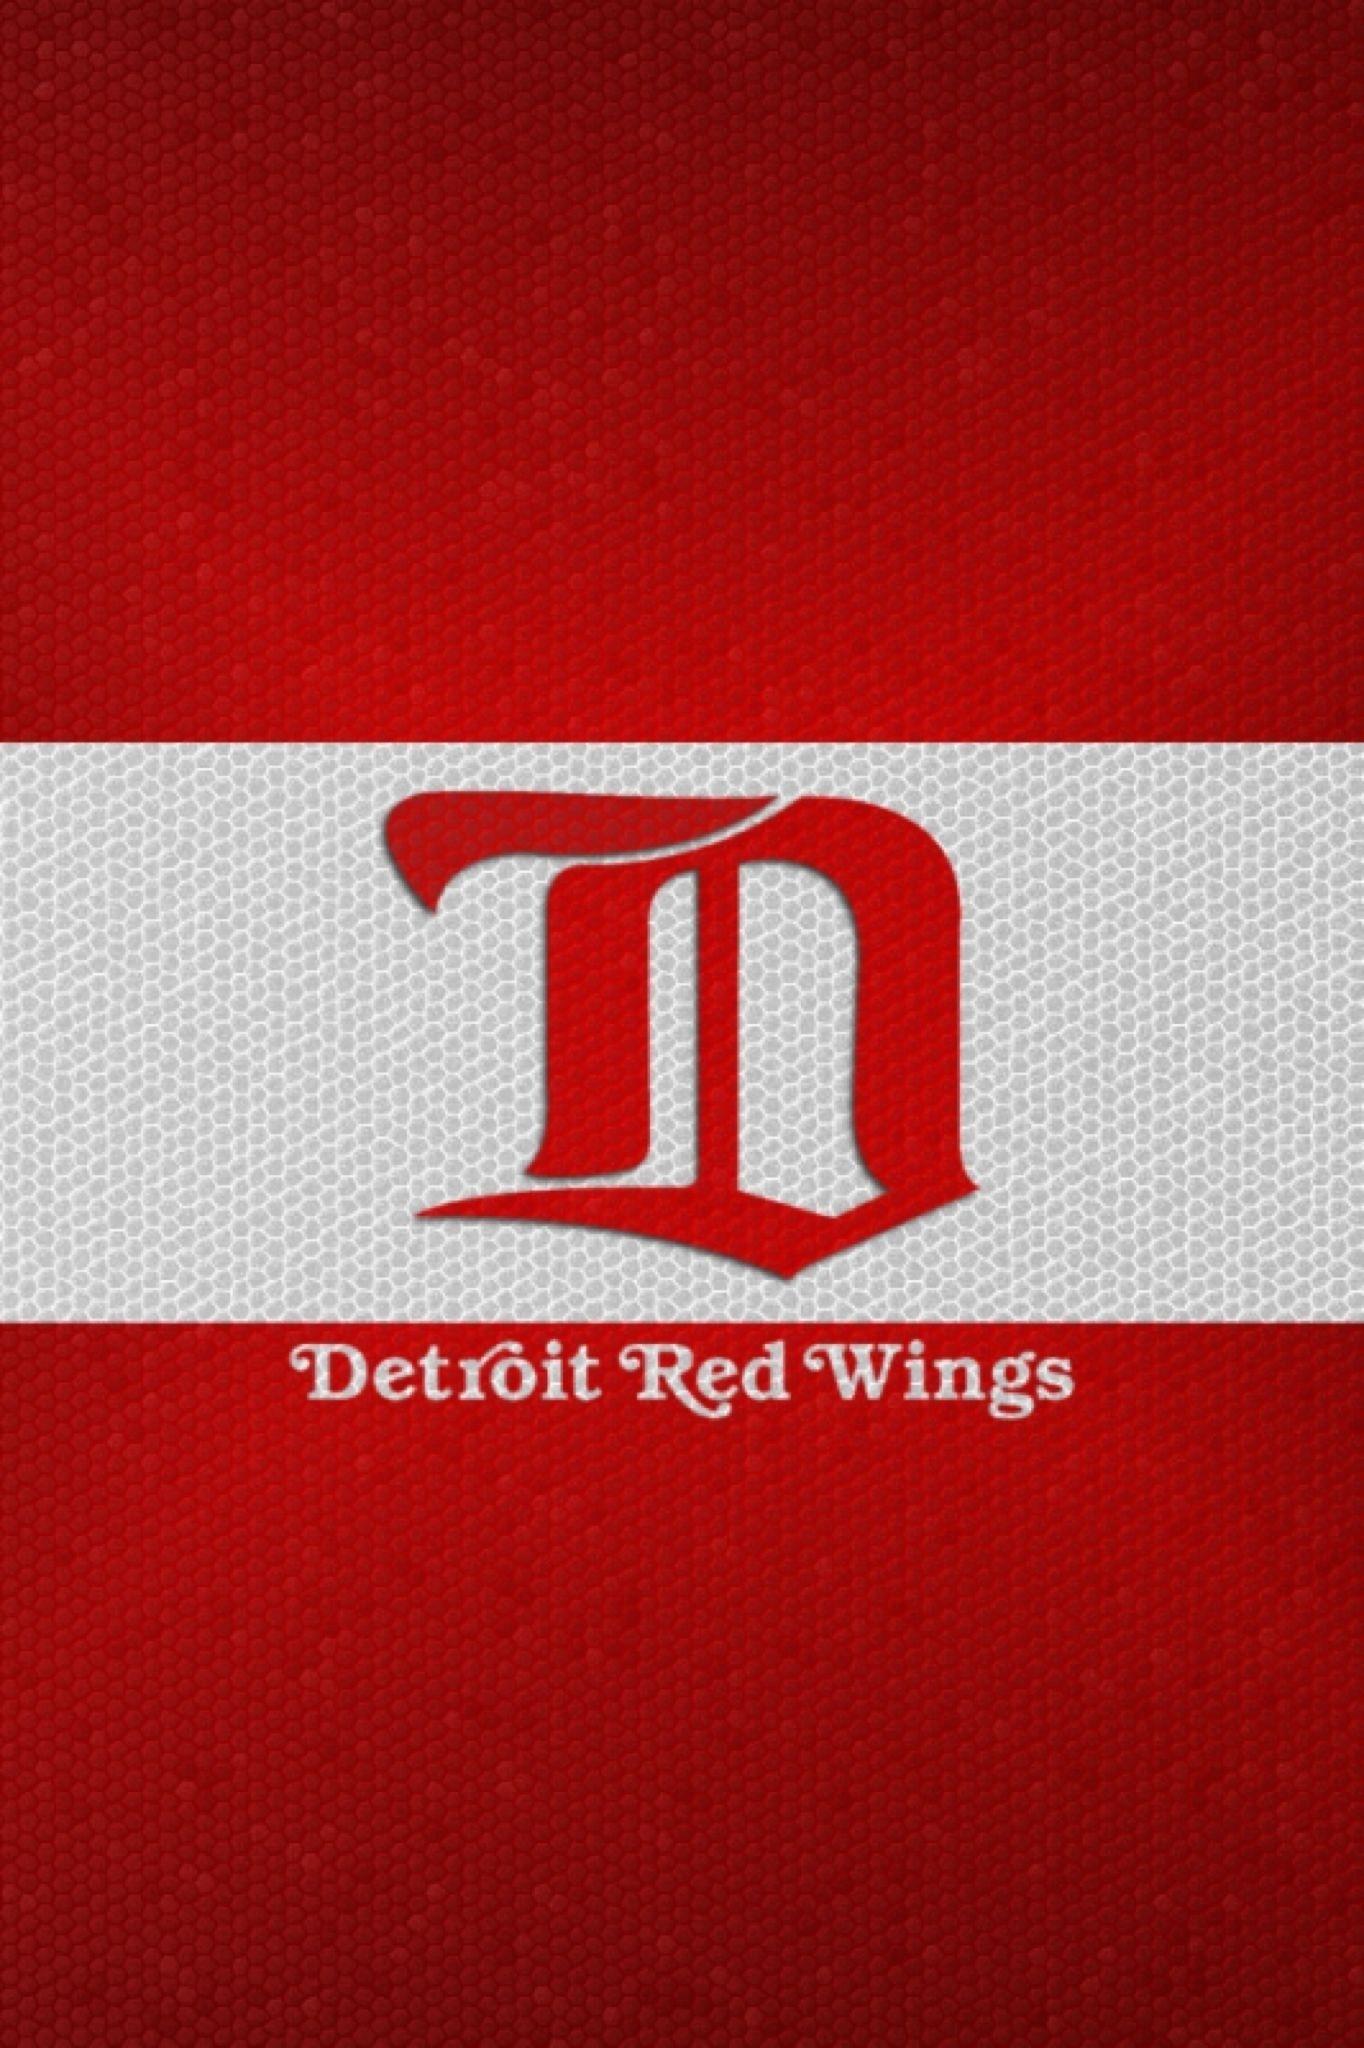 10 Most Popular Detroit Red Wings Iphone Wallpaper FULL HD 1080p For PC Desktop